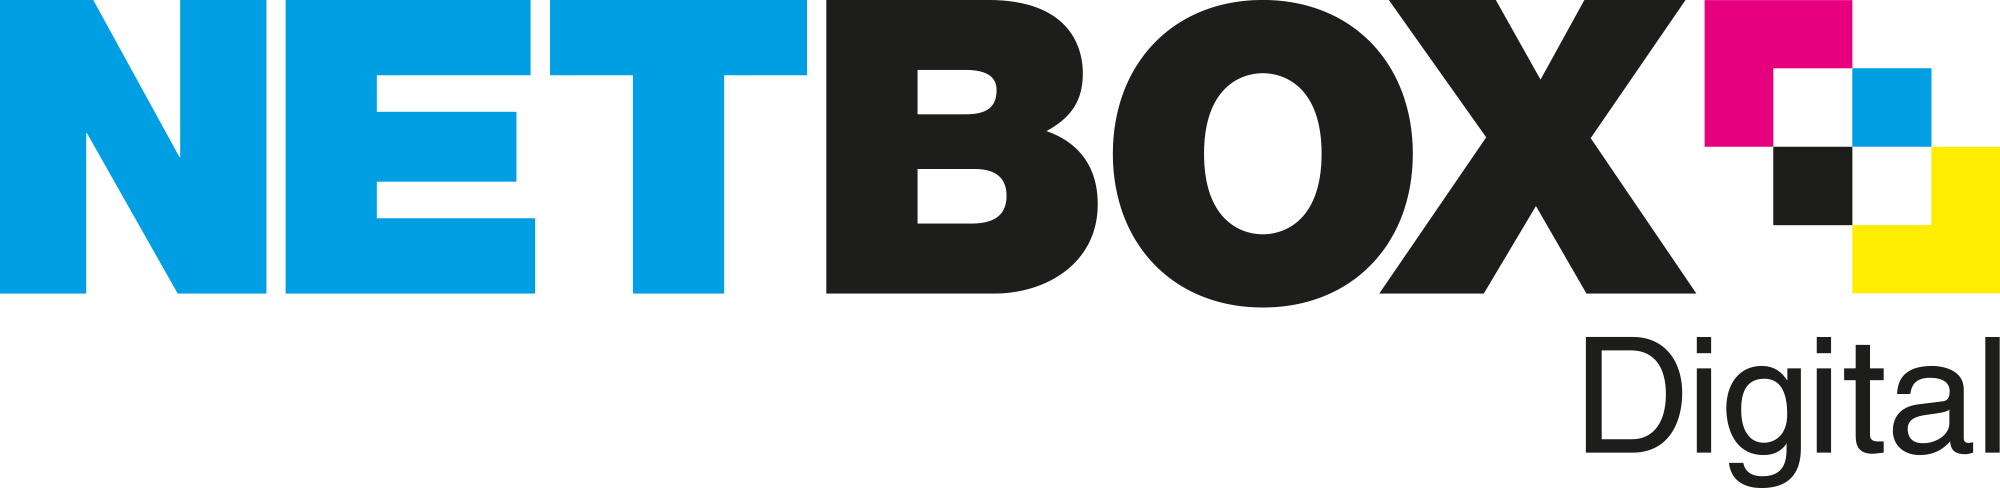 Netbox Digital Logo